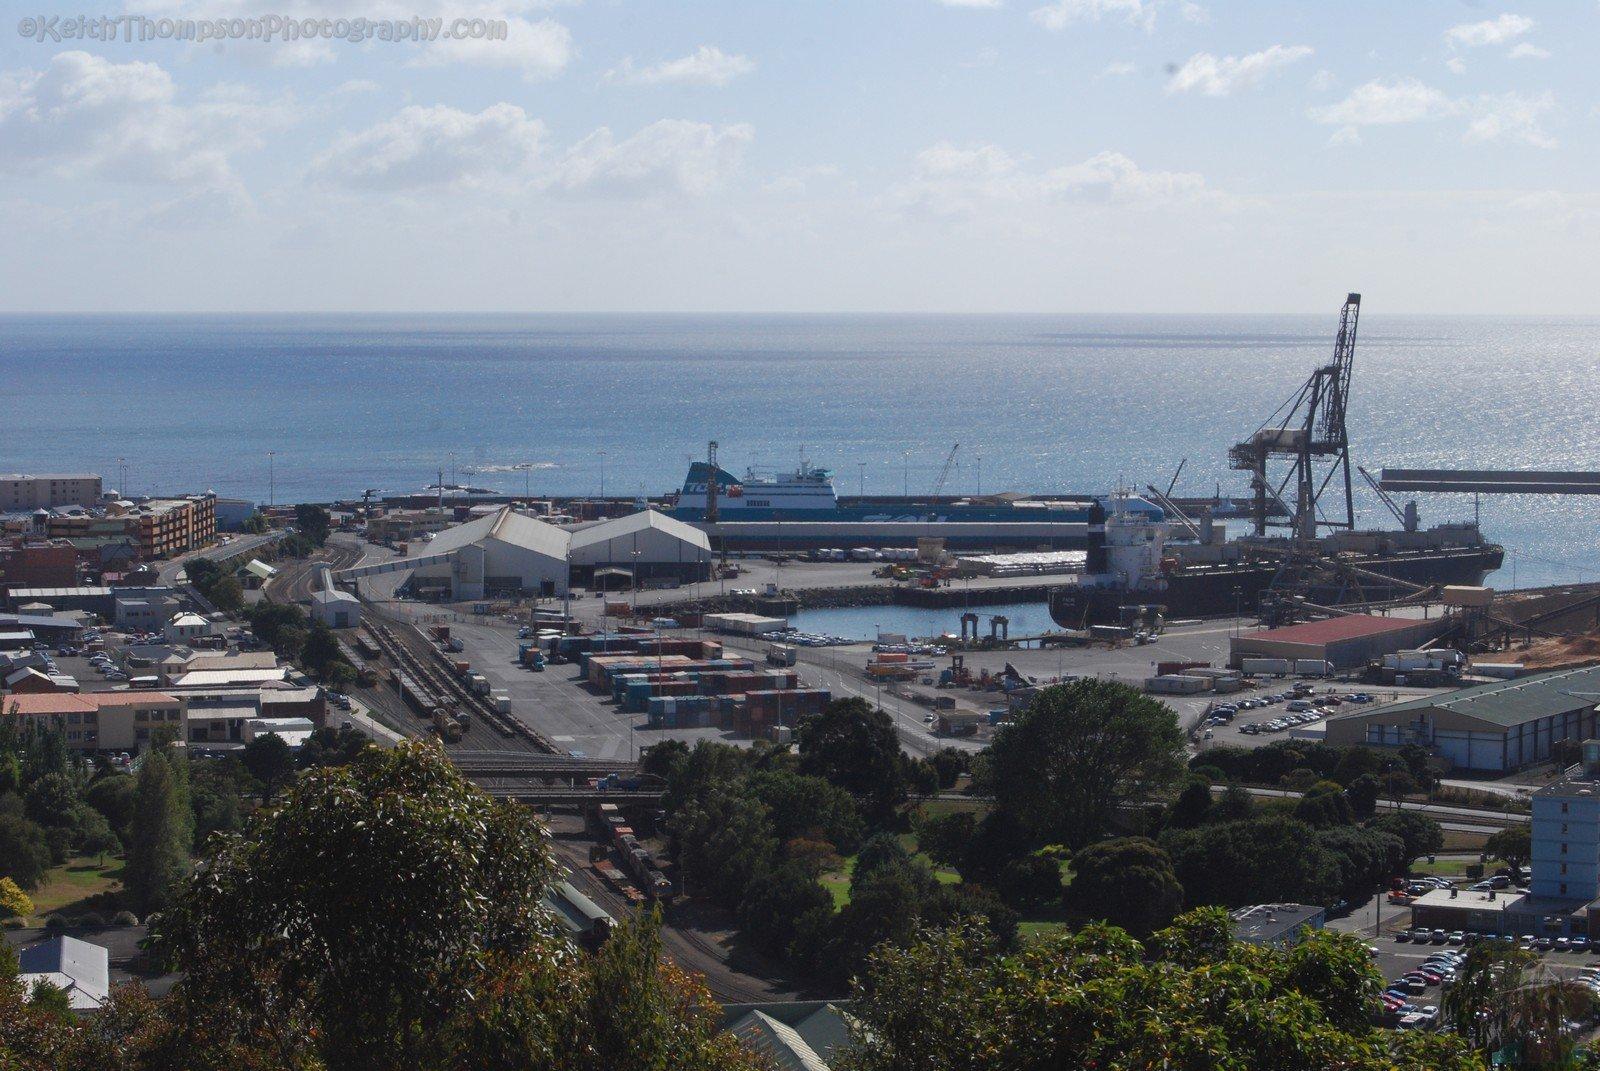 The Port of Burnie